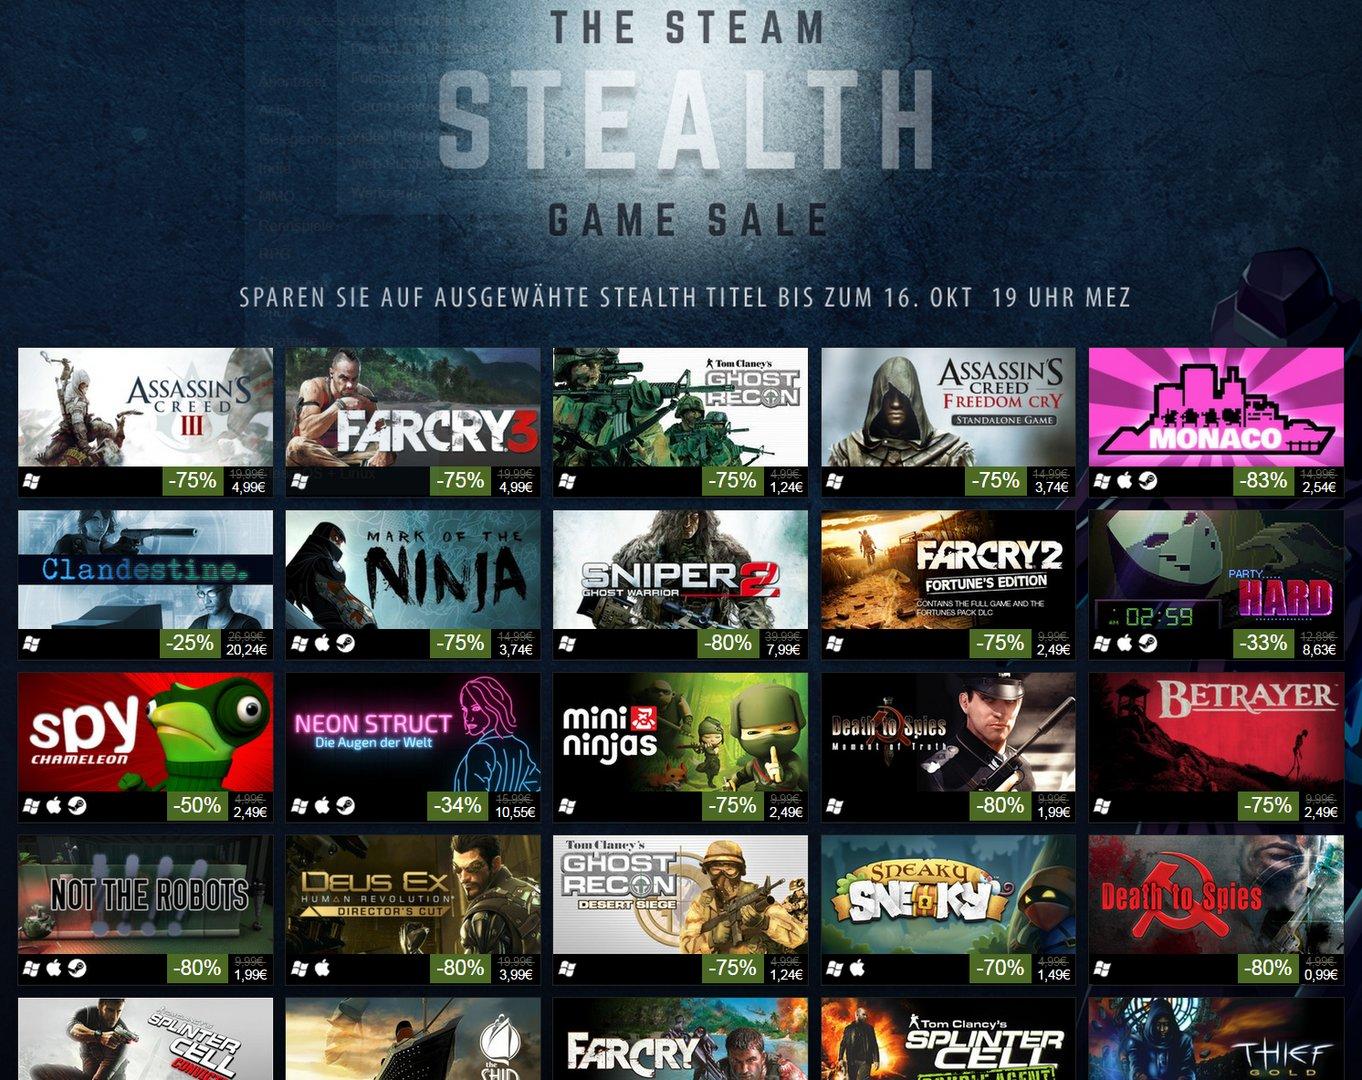 Steam Stealth Game Sale